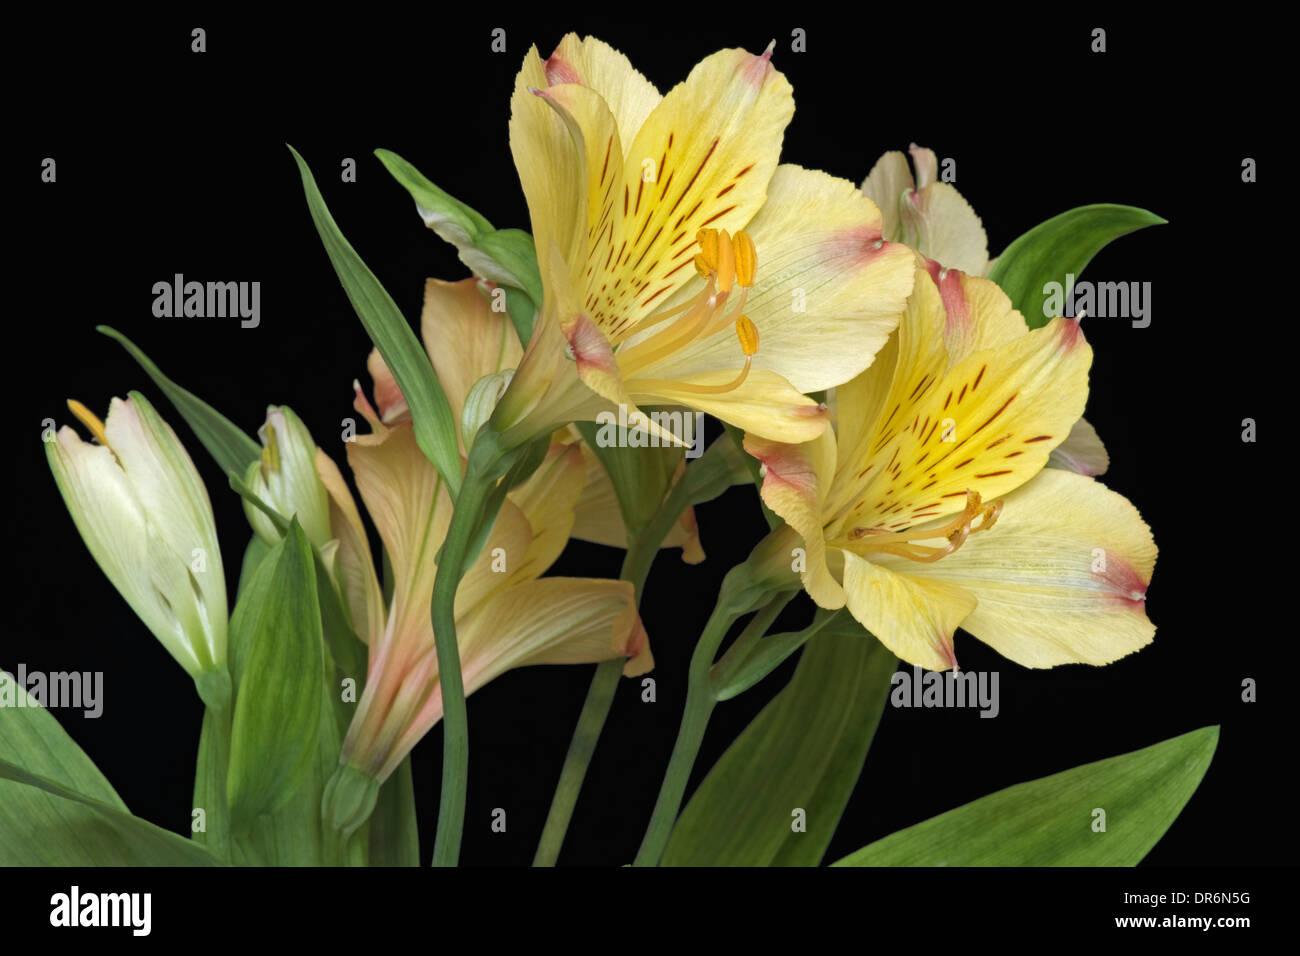 Peruvian lily (Alstroemeria x hybrid) Stock Photo